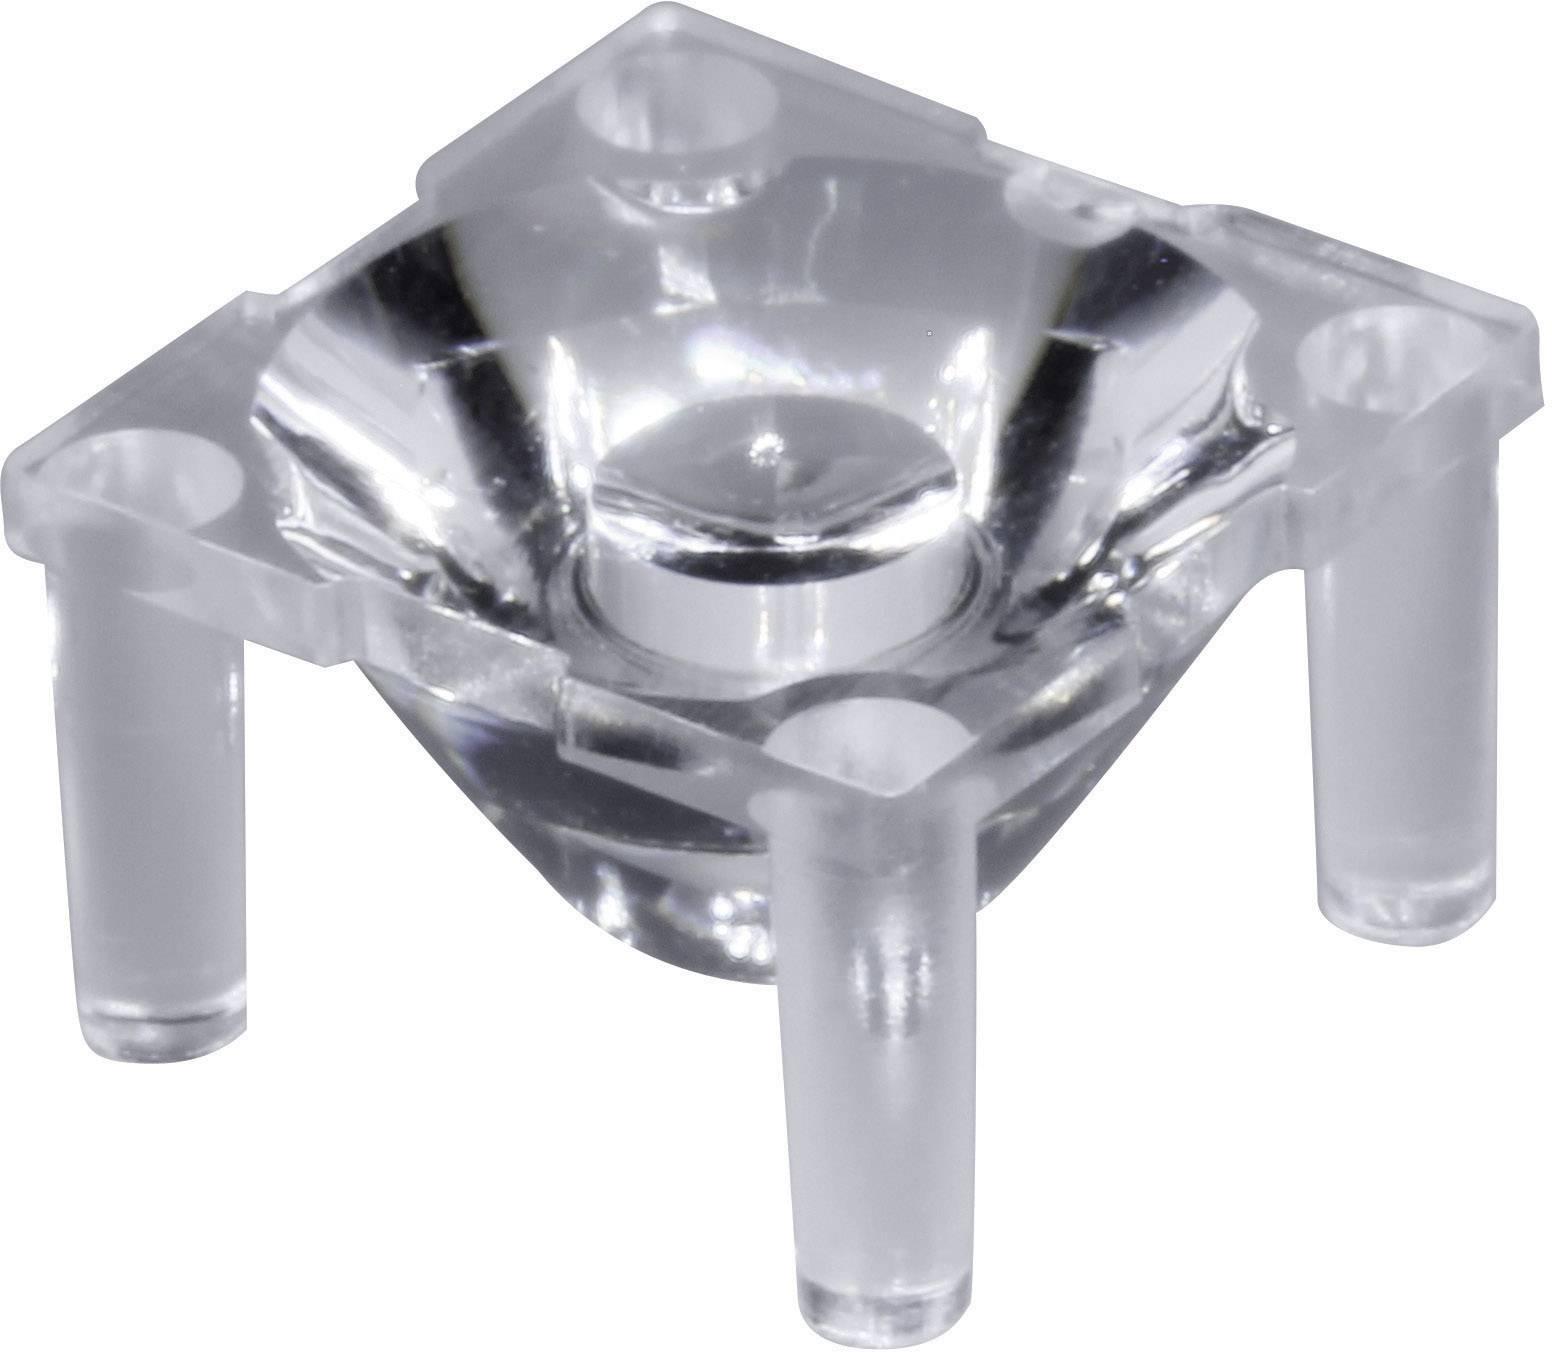 Optika pro Luxeon ® Rebel nebo Seoul Semiconductor ® Z5 Carclo 10412, 16.1°